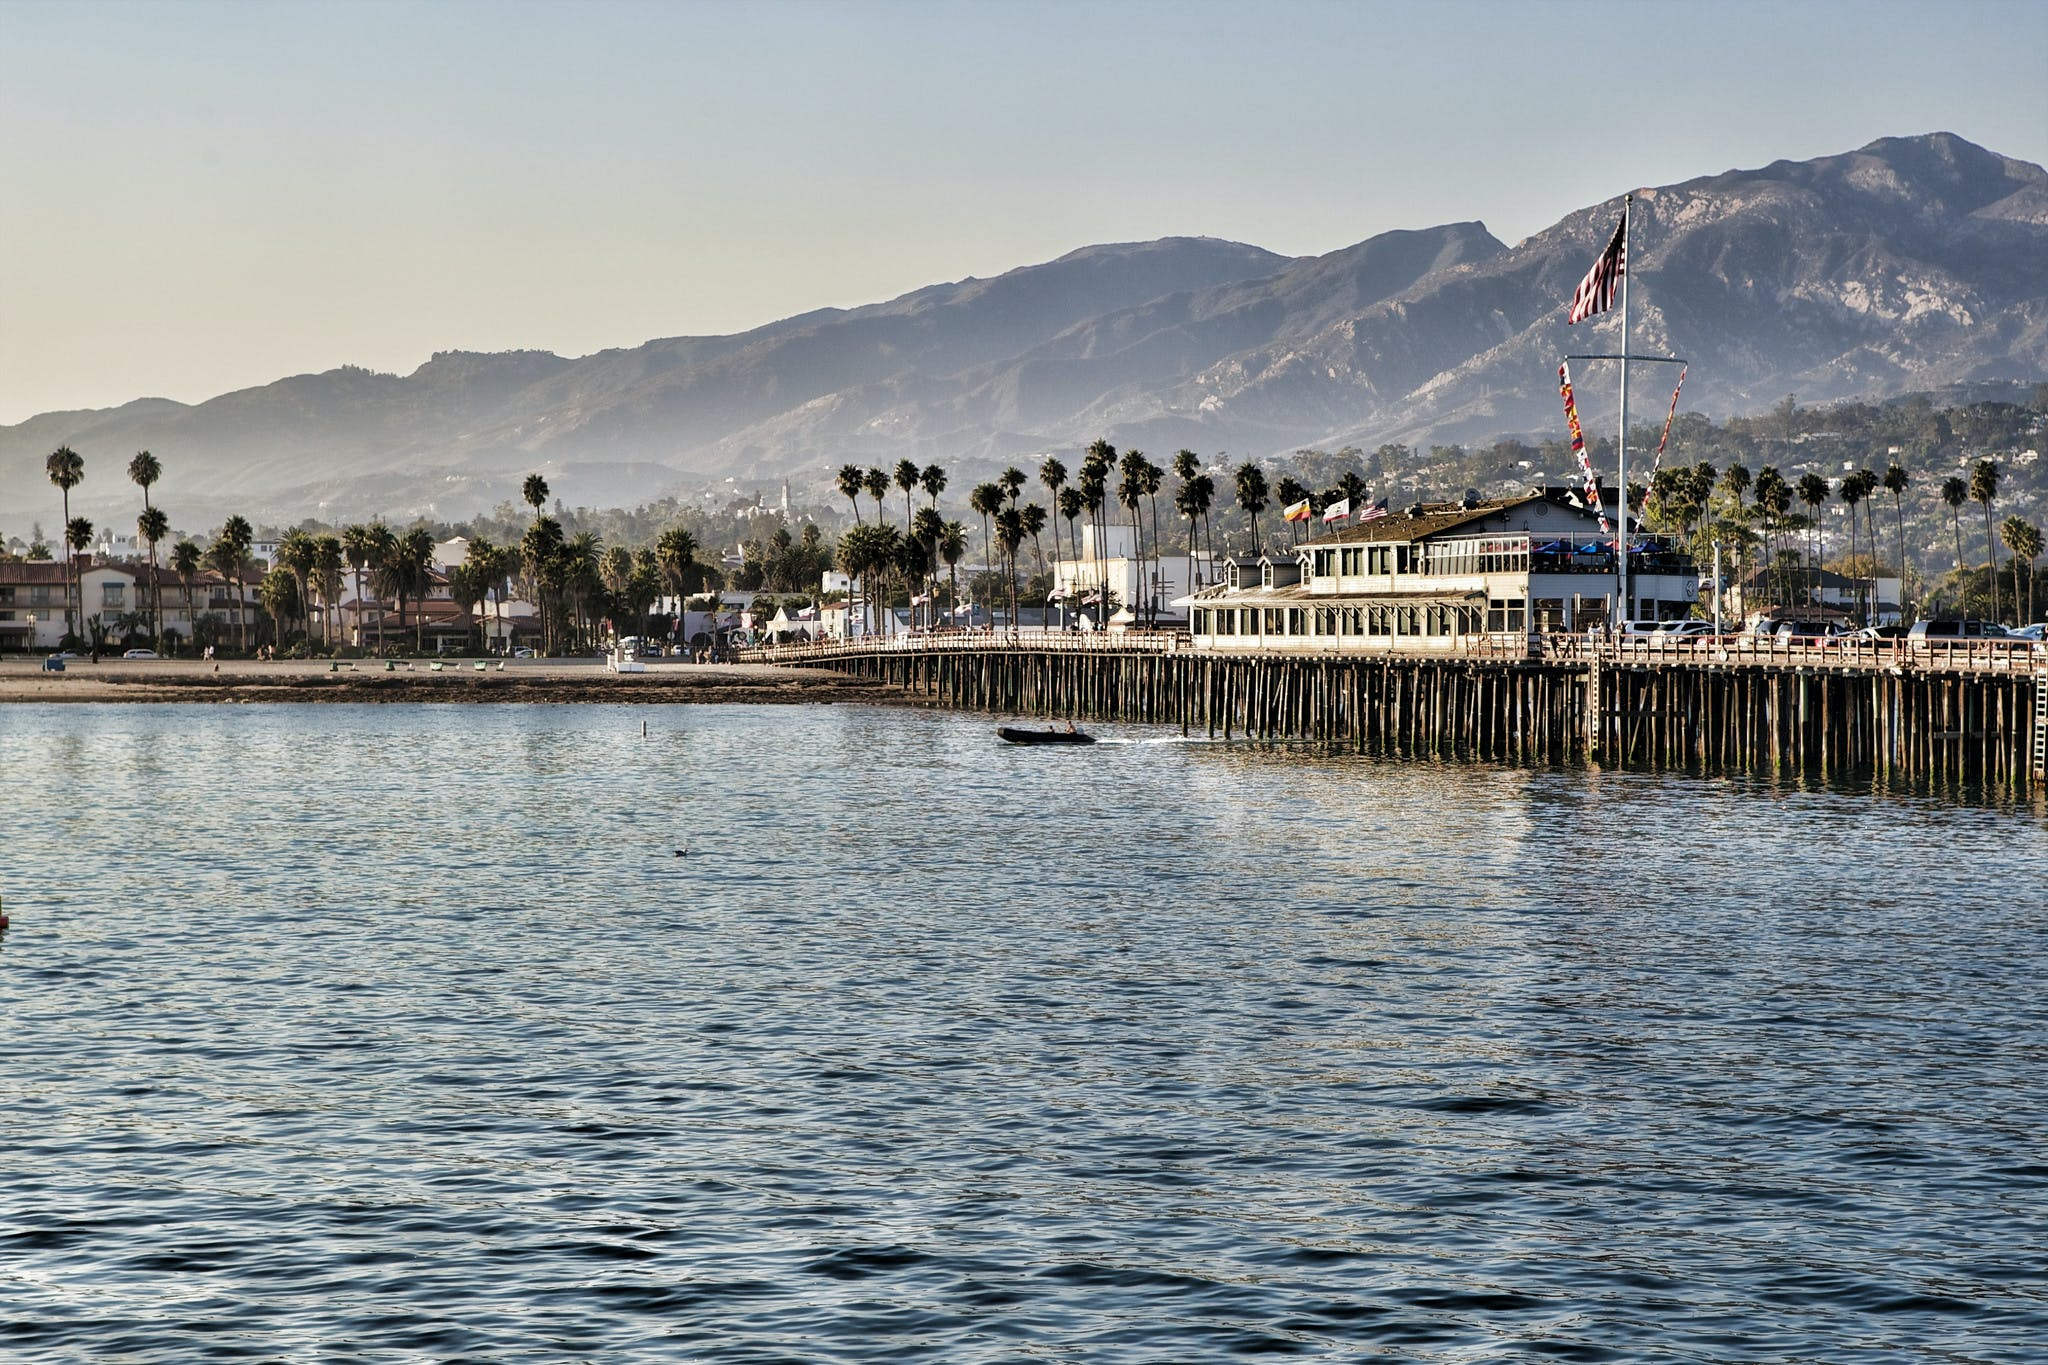 the pier on a sunny day in Santa Barbara